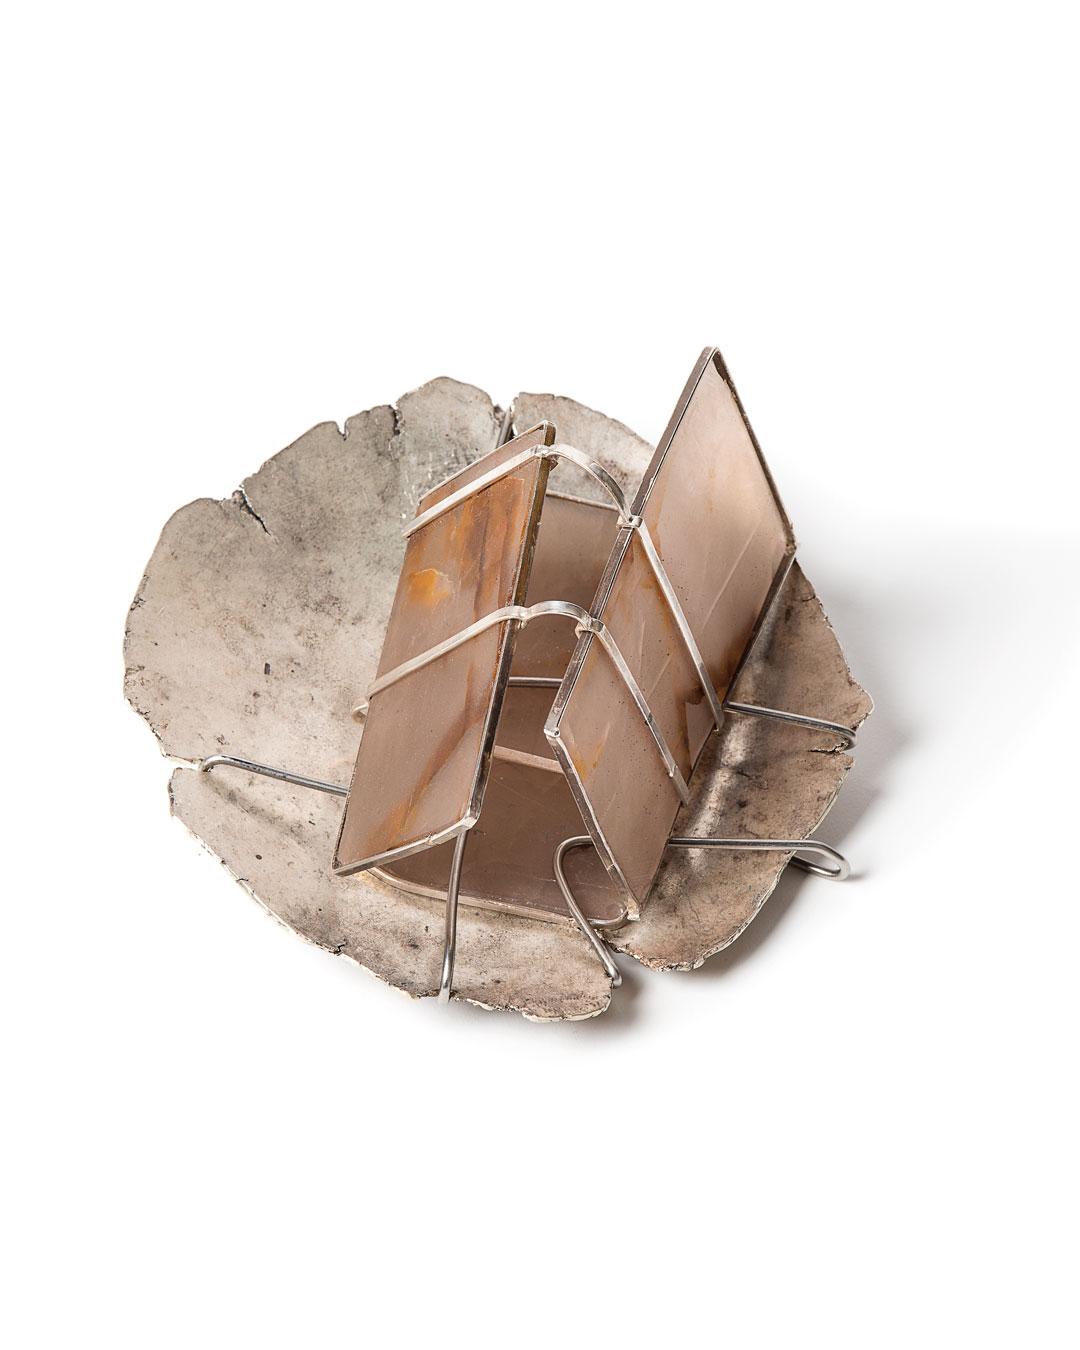 Rudolf Kocéa, Mirror, 2019, brooch; agate, silver (800), stainless steel, ø 110 mm, €3200